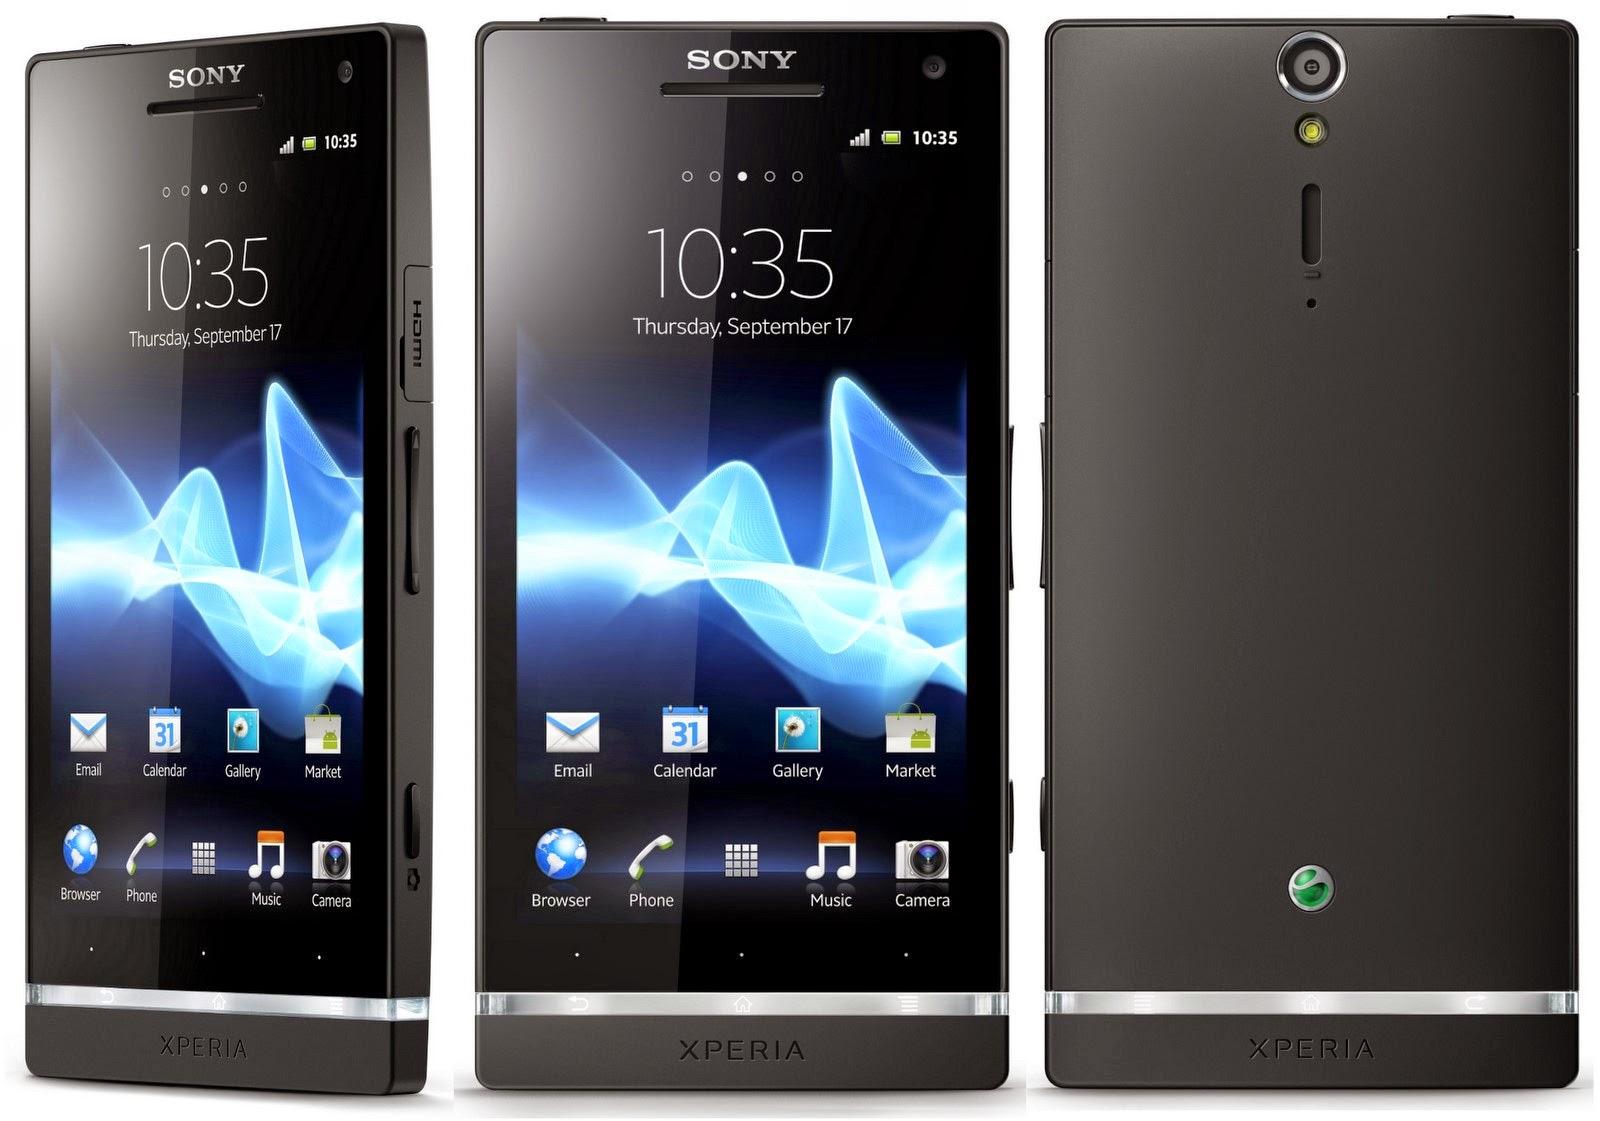 Daftar Harga HP Sony Xperia Tebaru 2014